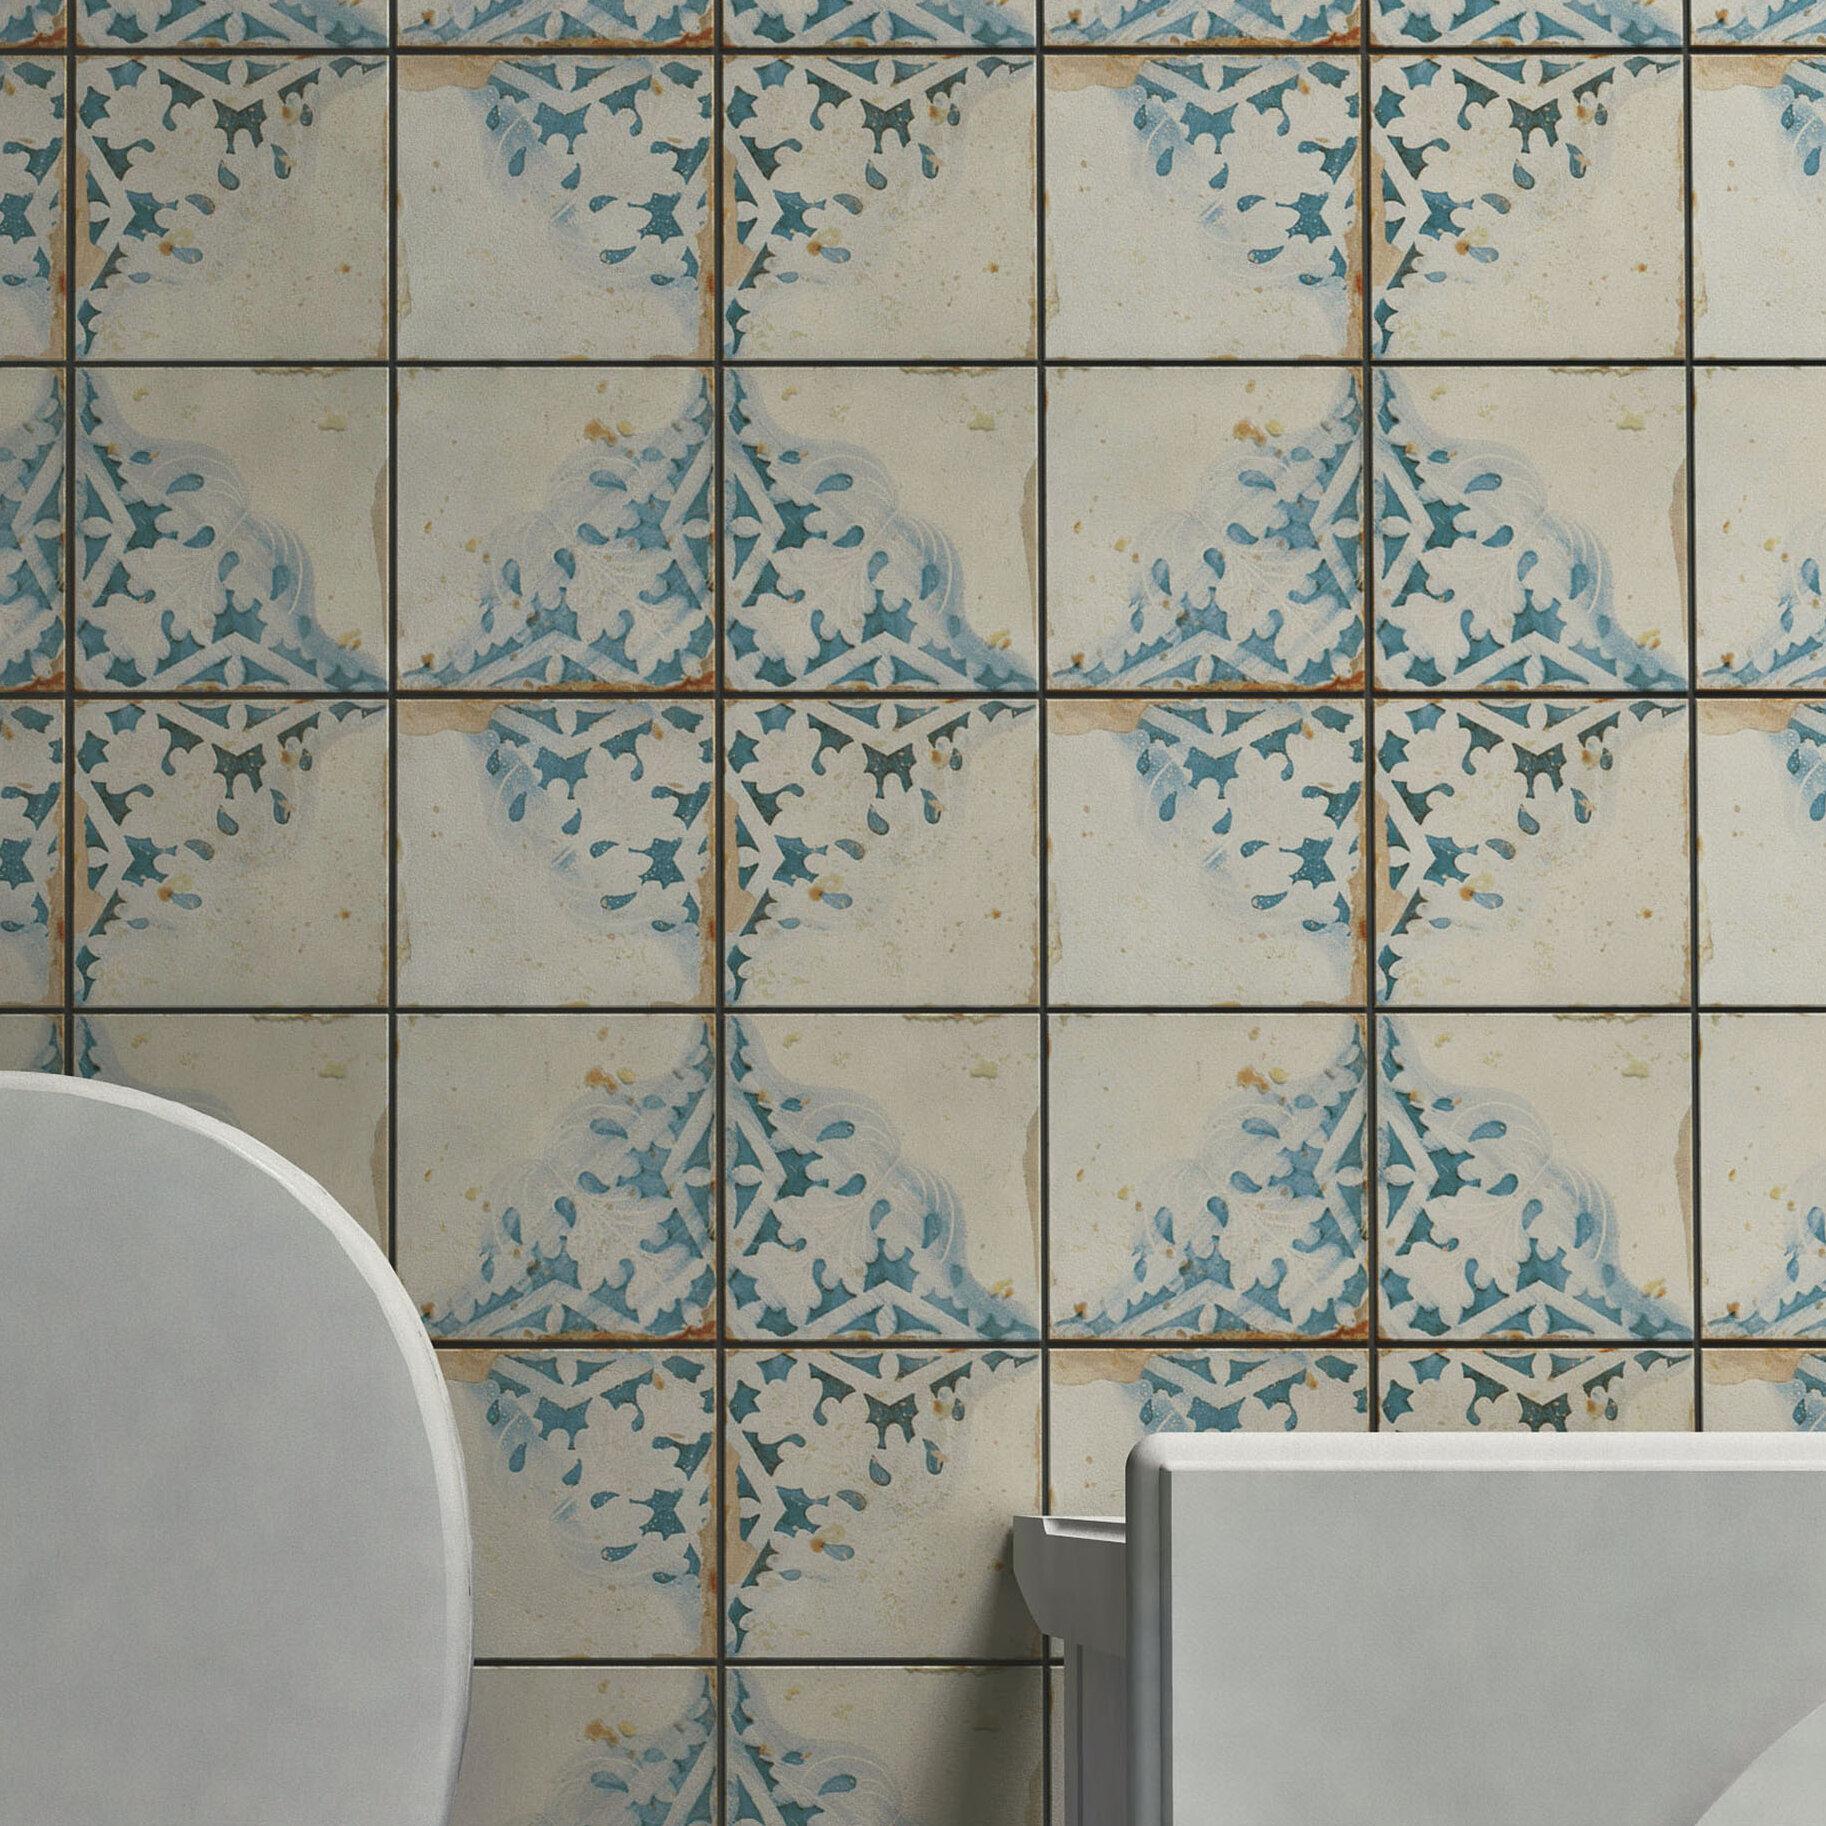 13 X 13 Ceramic Tiles Zef Jam